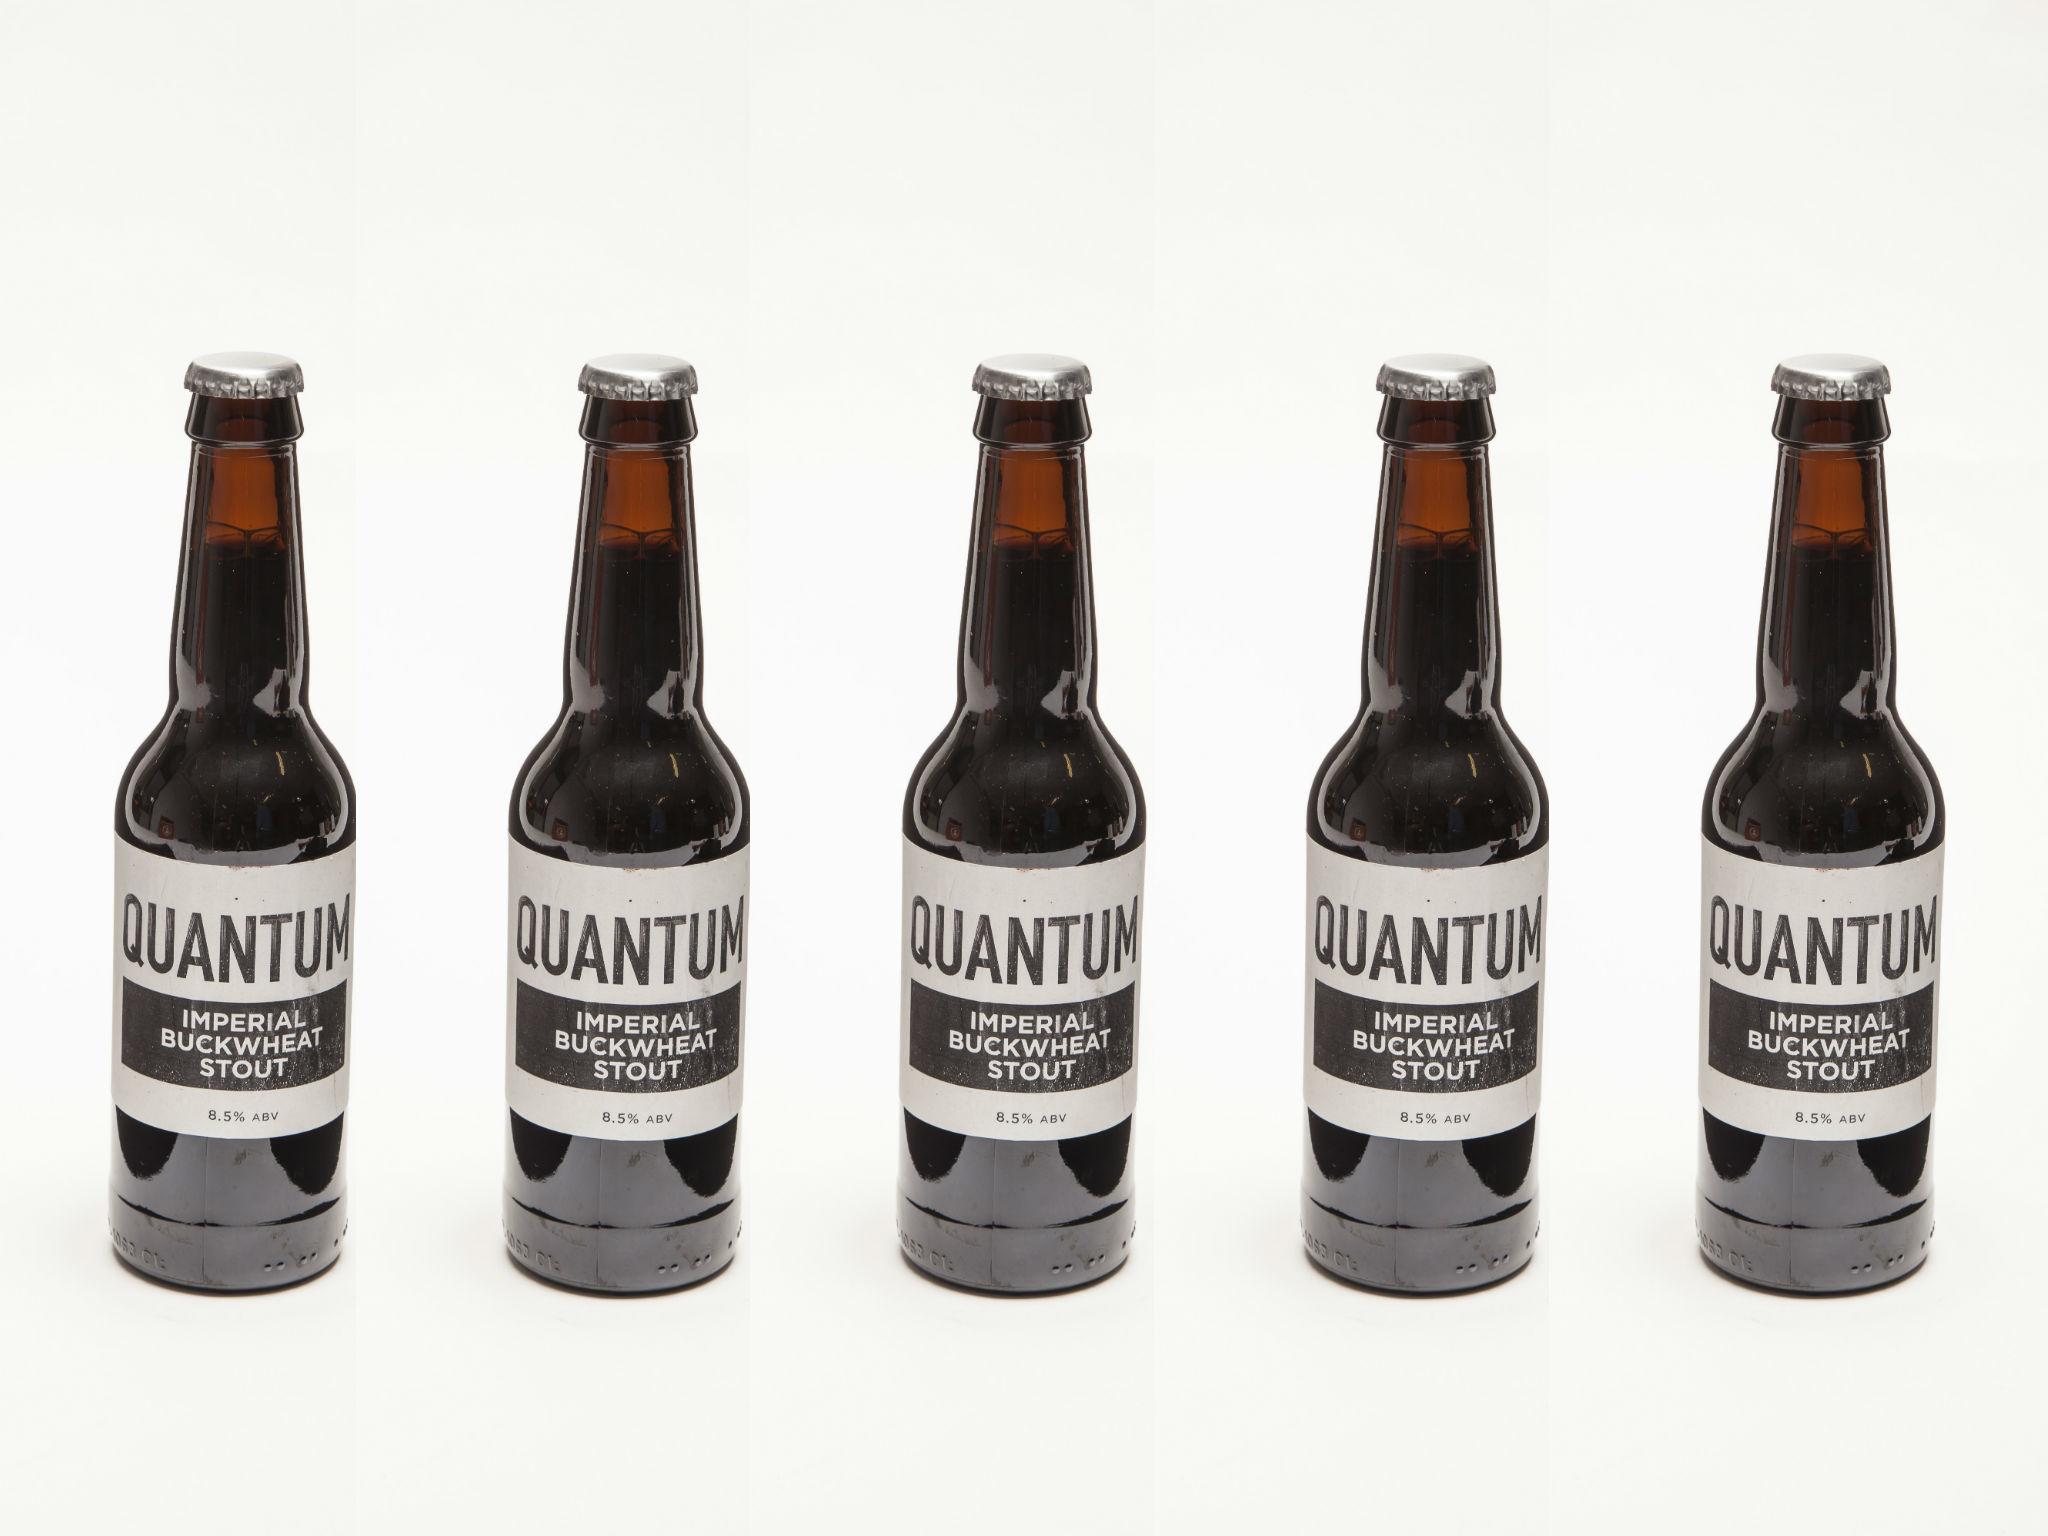 Quantum – Imperial Buckwheat Stout